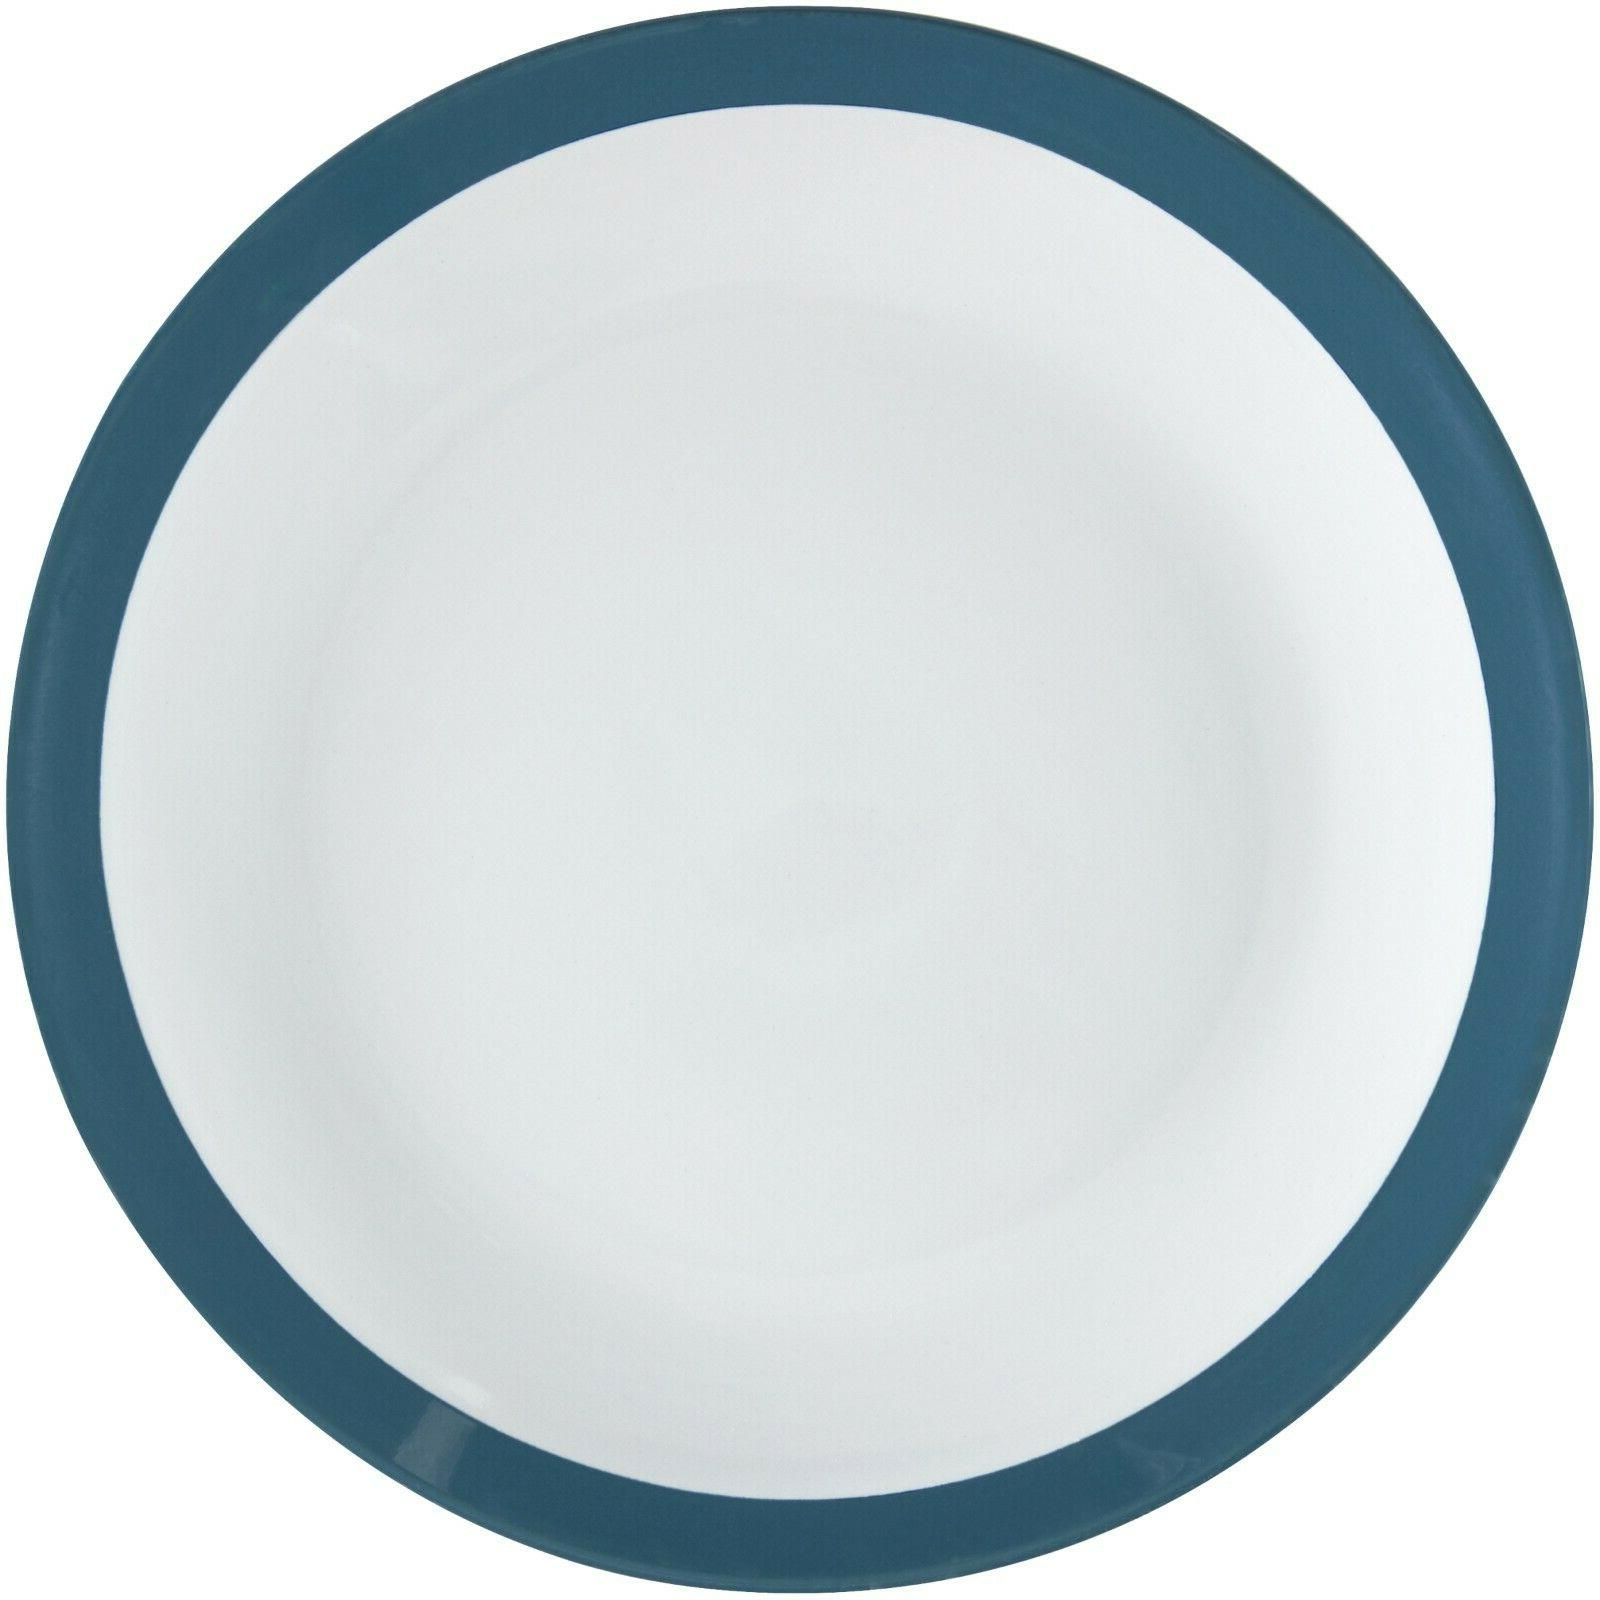 Ceramic & Stoneware Bowls